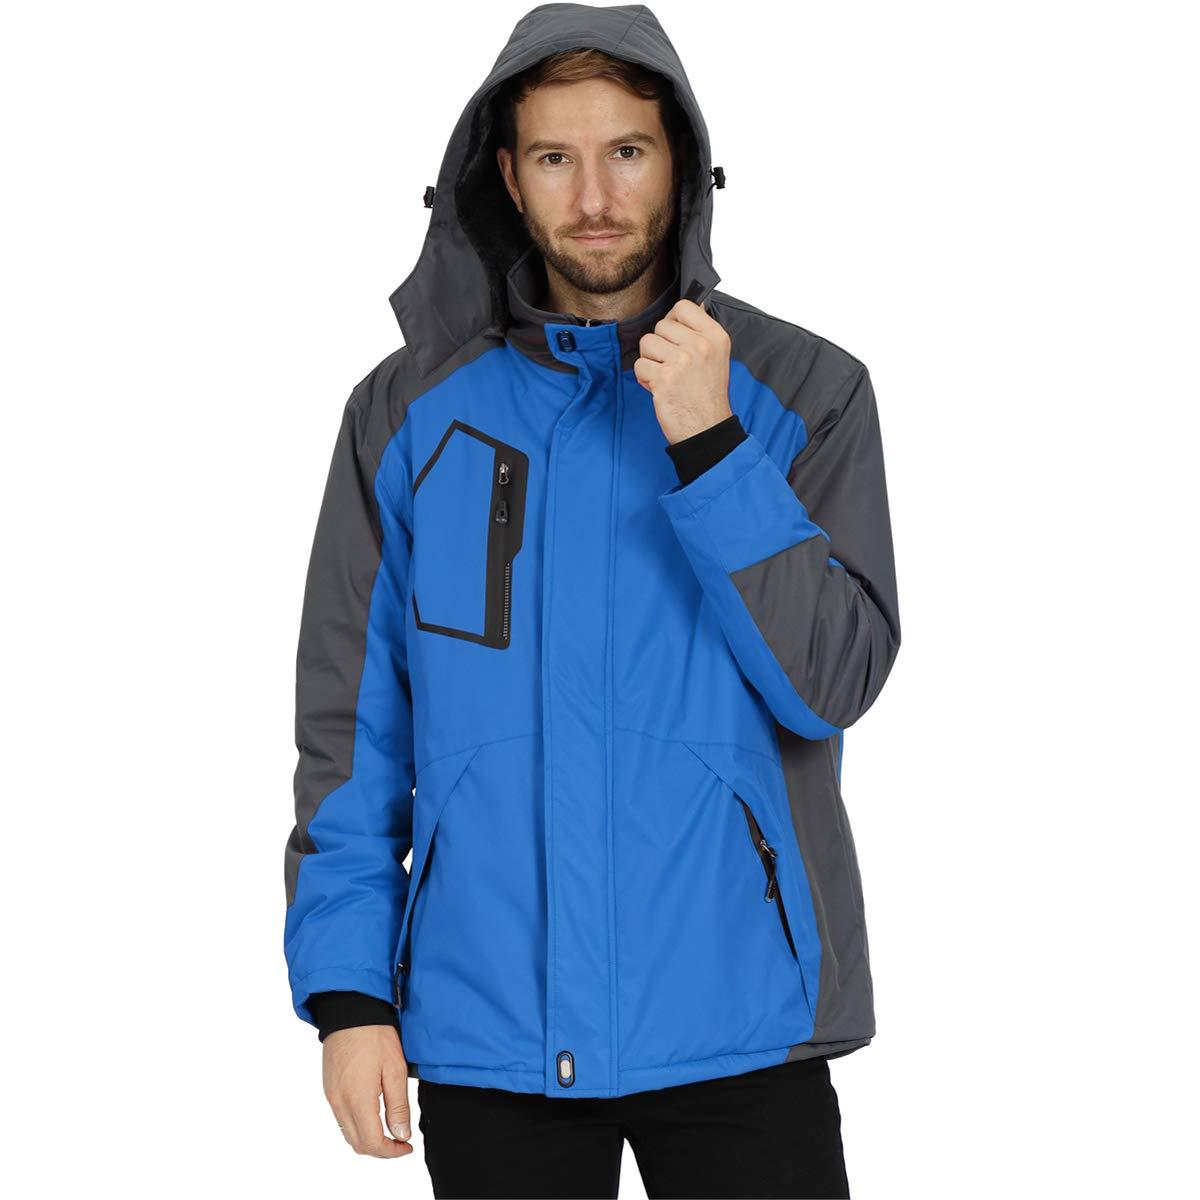 Mens Snow Jacket Waterproof Ski Jackets Windproof Mountain Rain Jacket